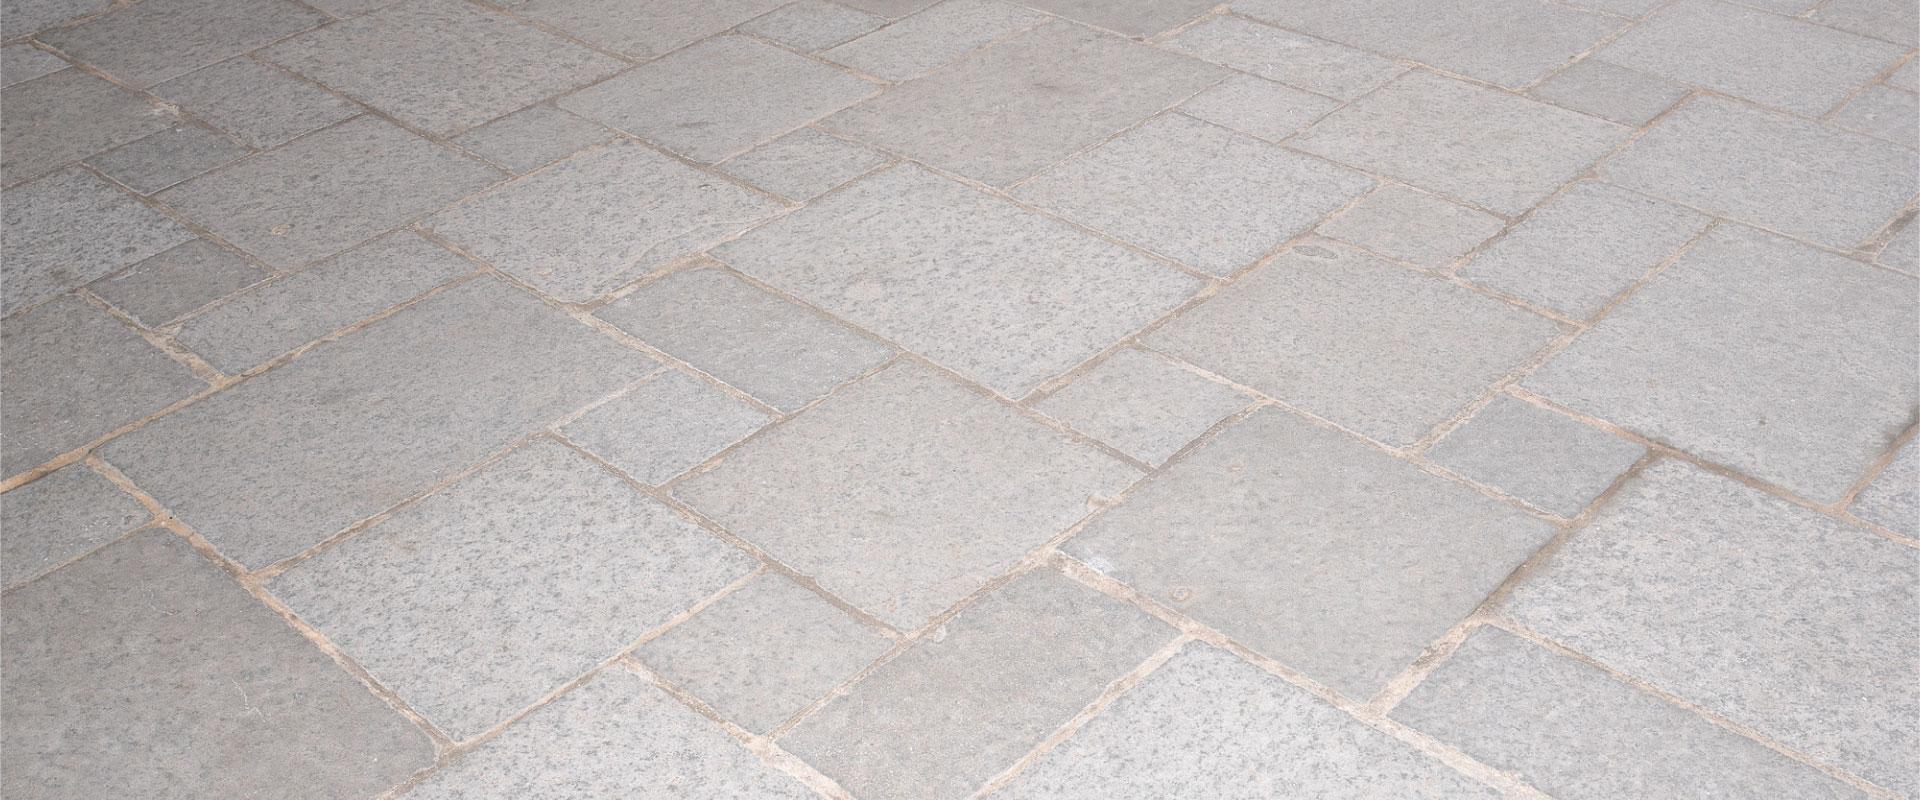 zubieta-constructions-pierres-opus-romain